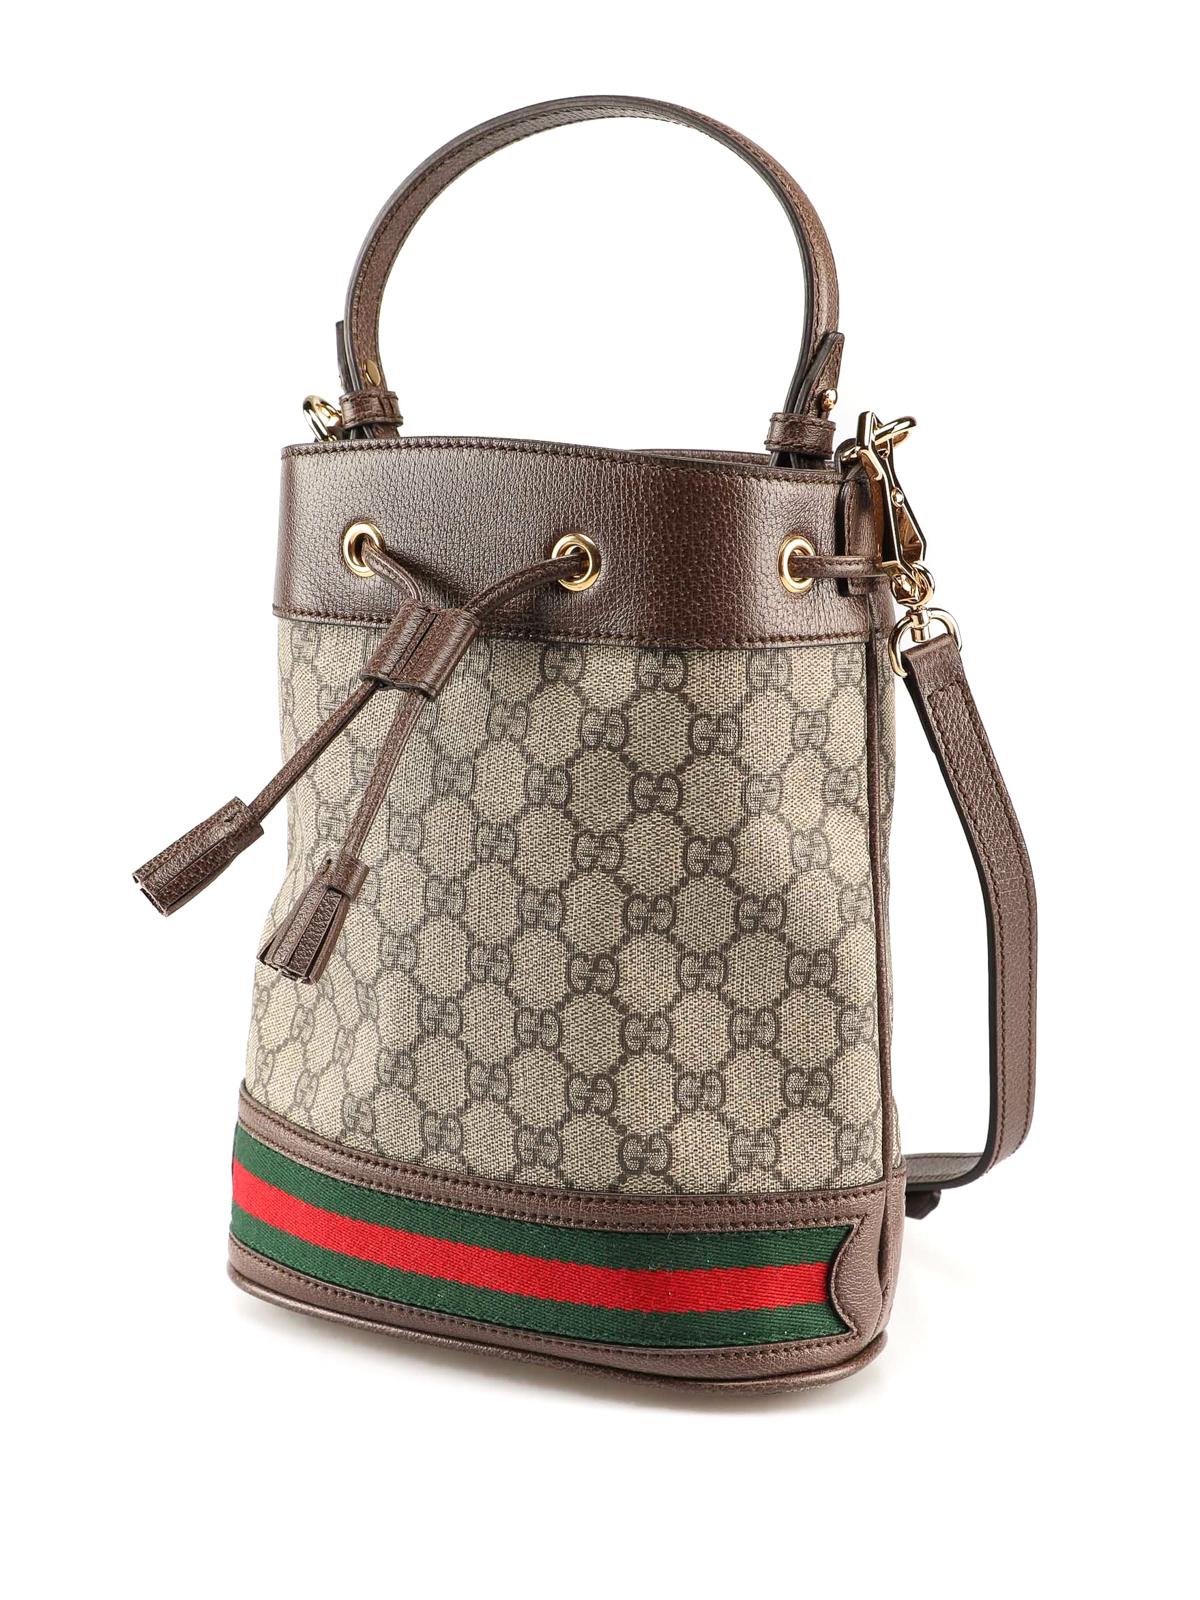 Gucci Ophidia Bucket Bag کیف خمره ای 55062196i3b8745